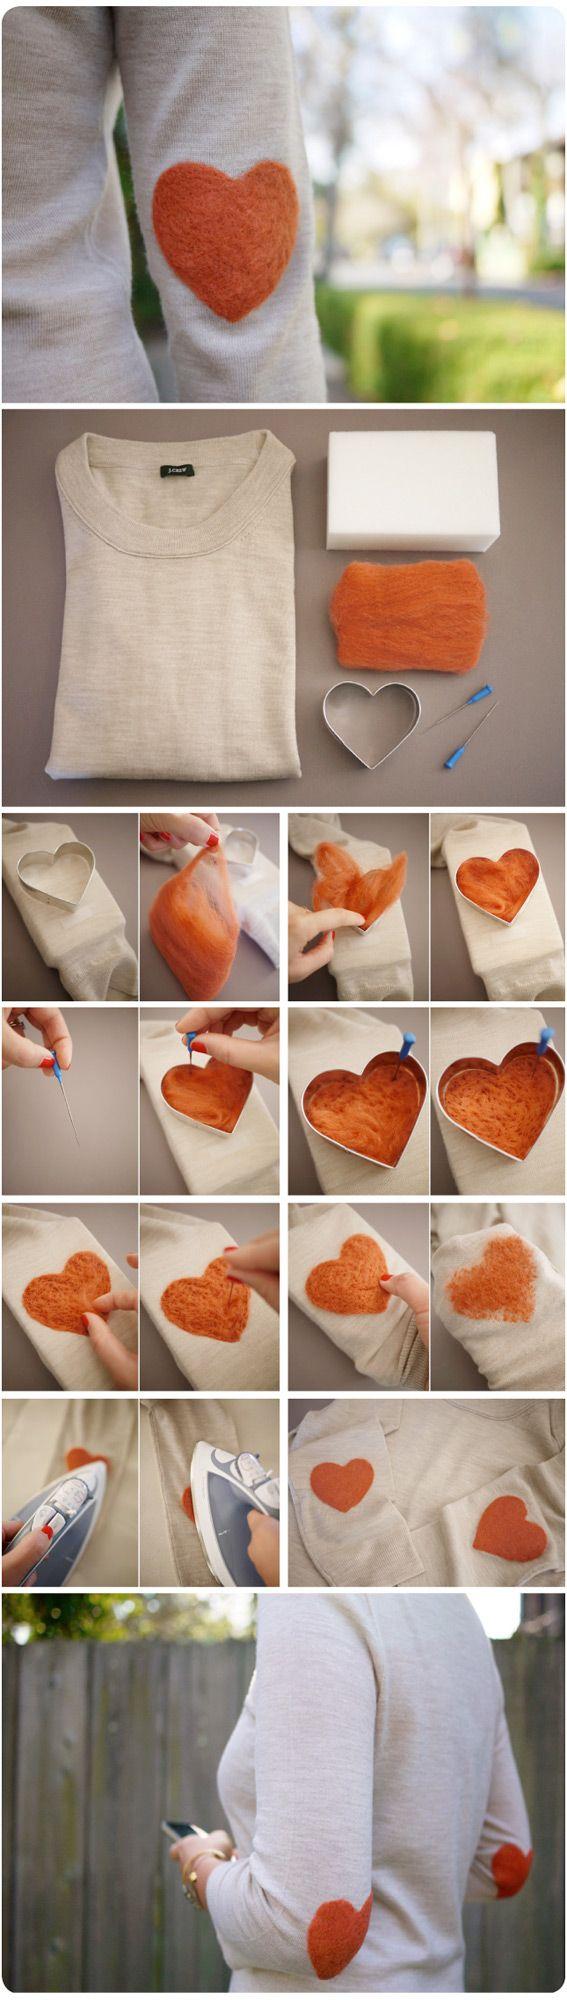 DIY Elbow Patches  Amazing idea!